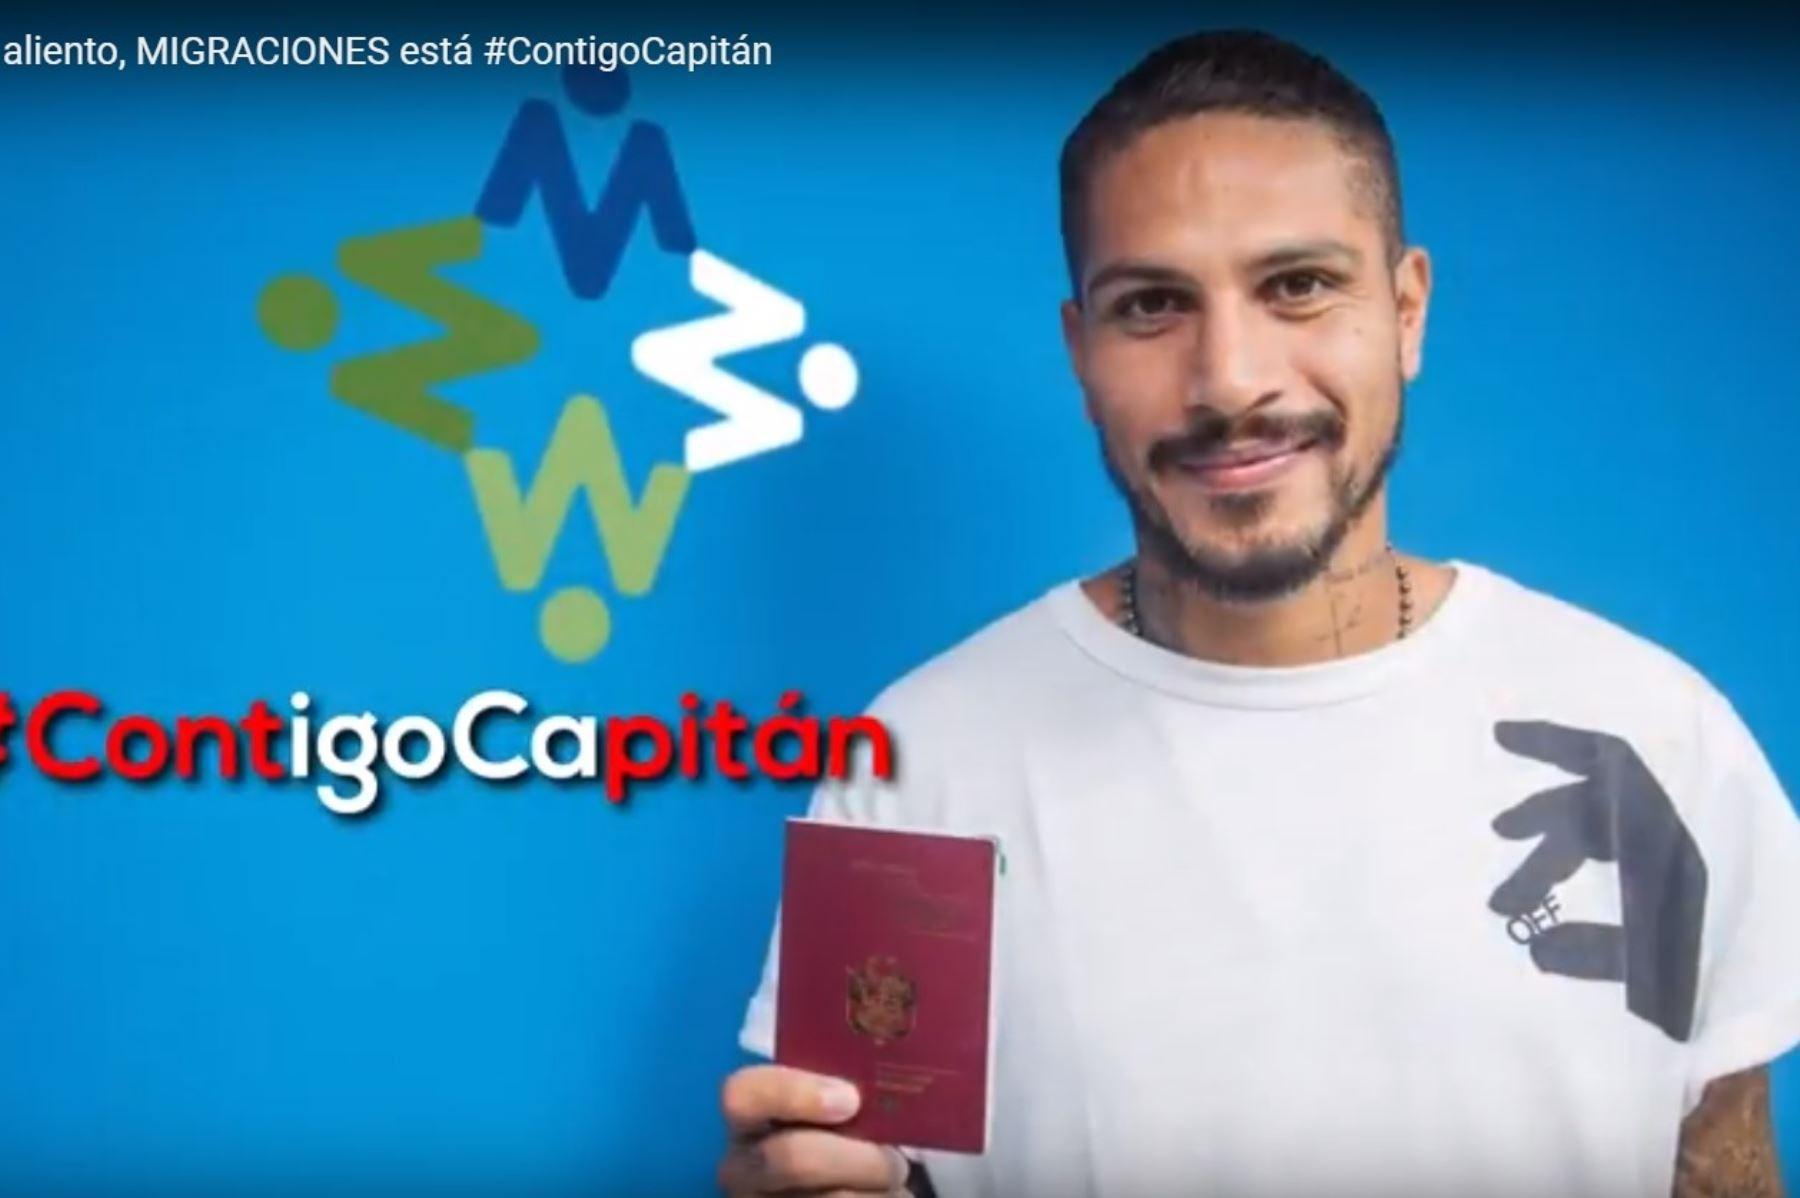 Migraciones entregó pasaporte electrónico a Paolo Guerrero. Foto: ANDINA/Difusión.